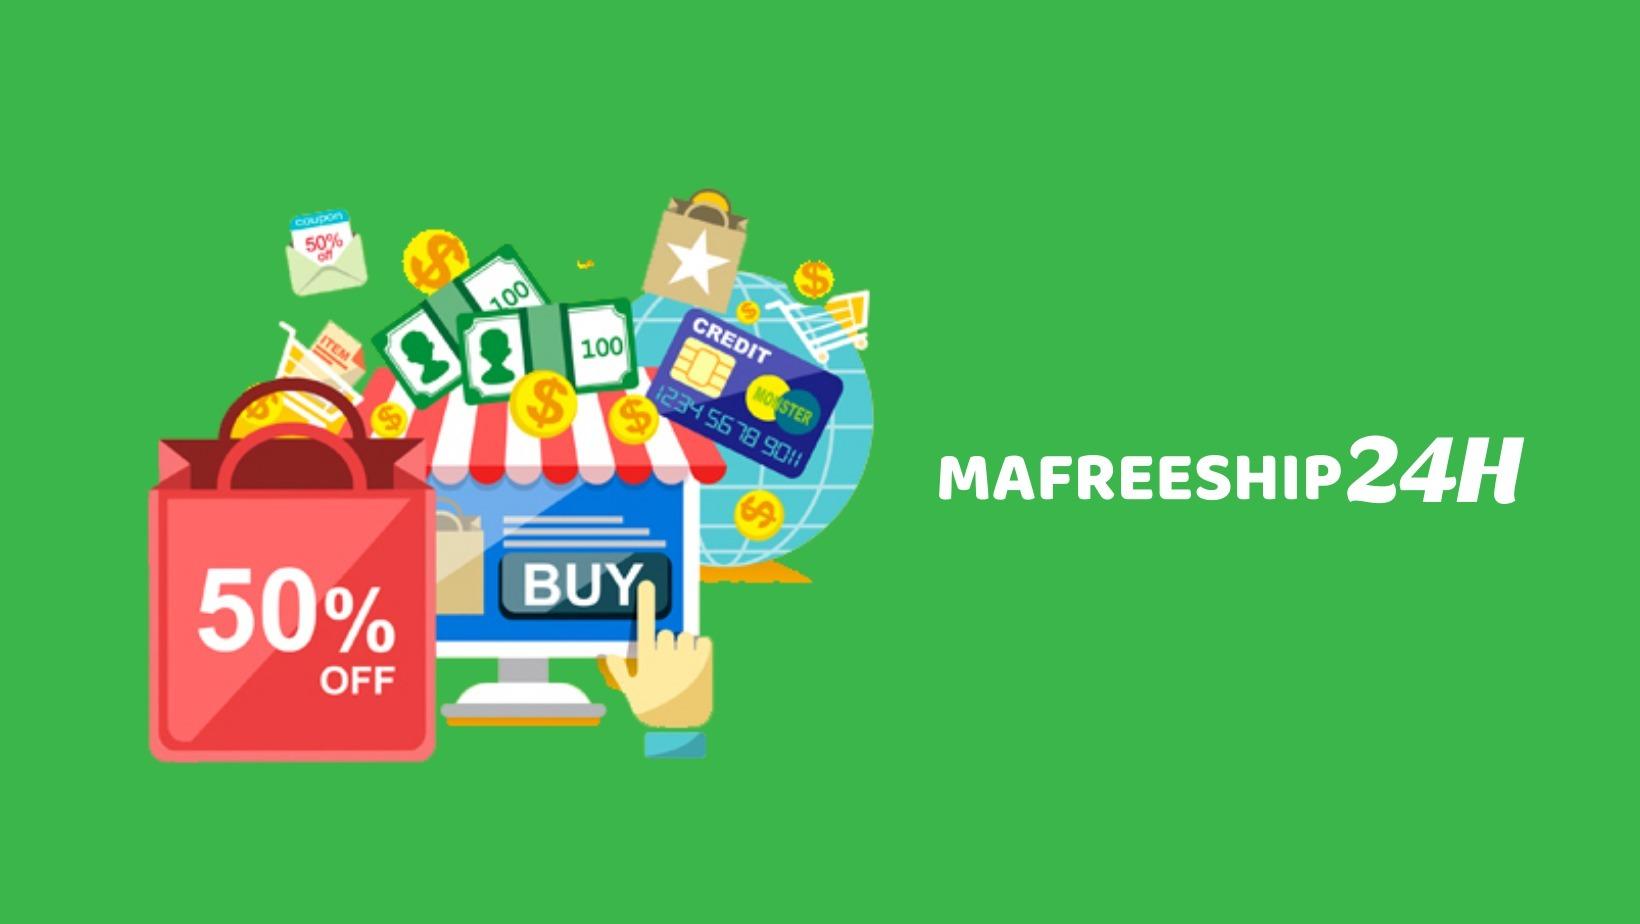 Mafreeship24h (@mafreeship24h) Cover Image